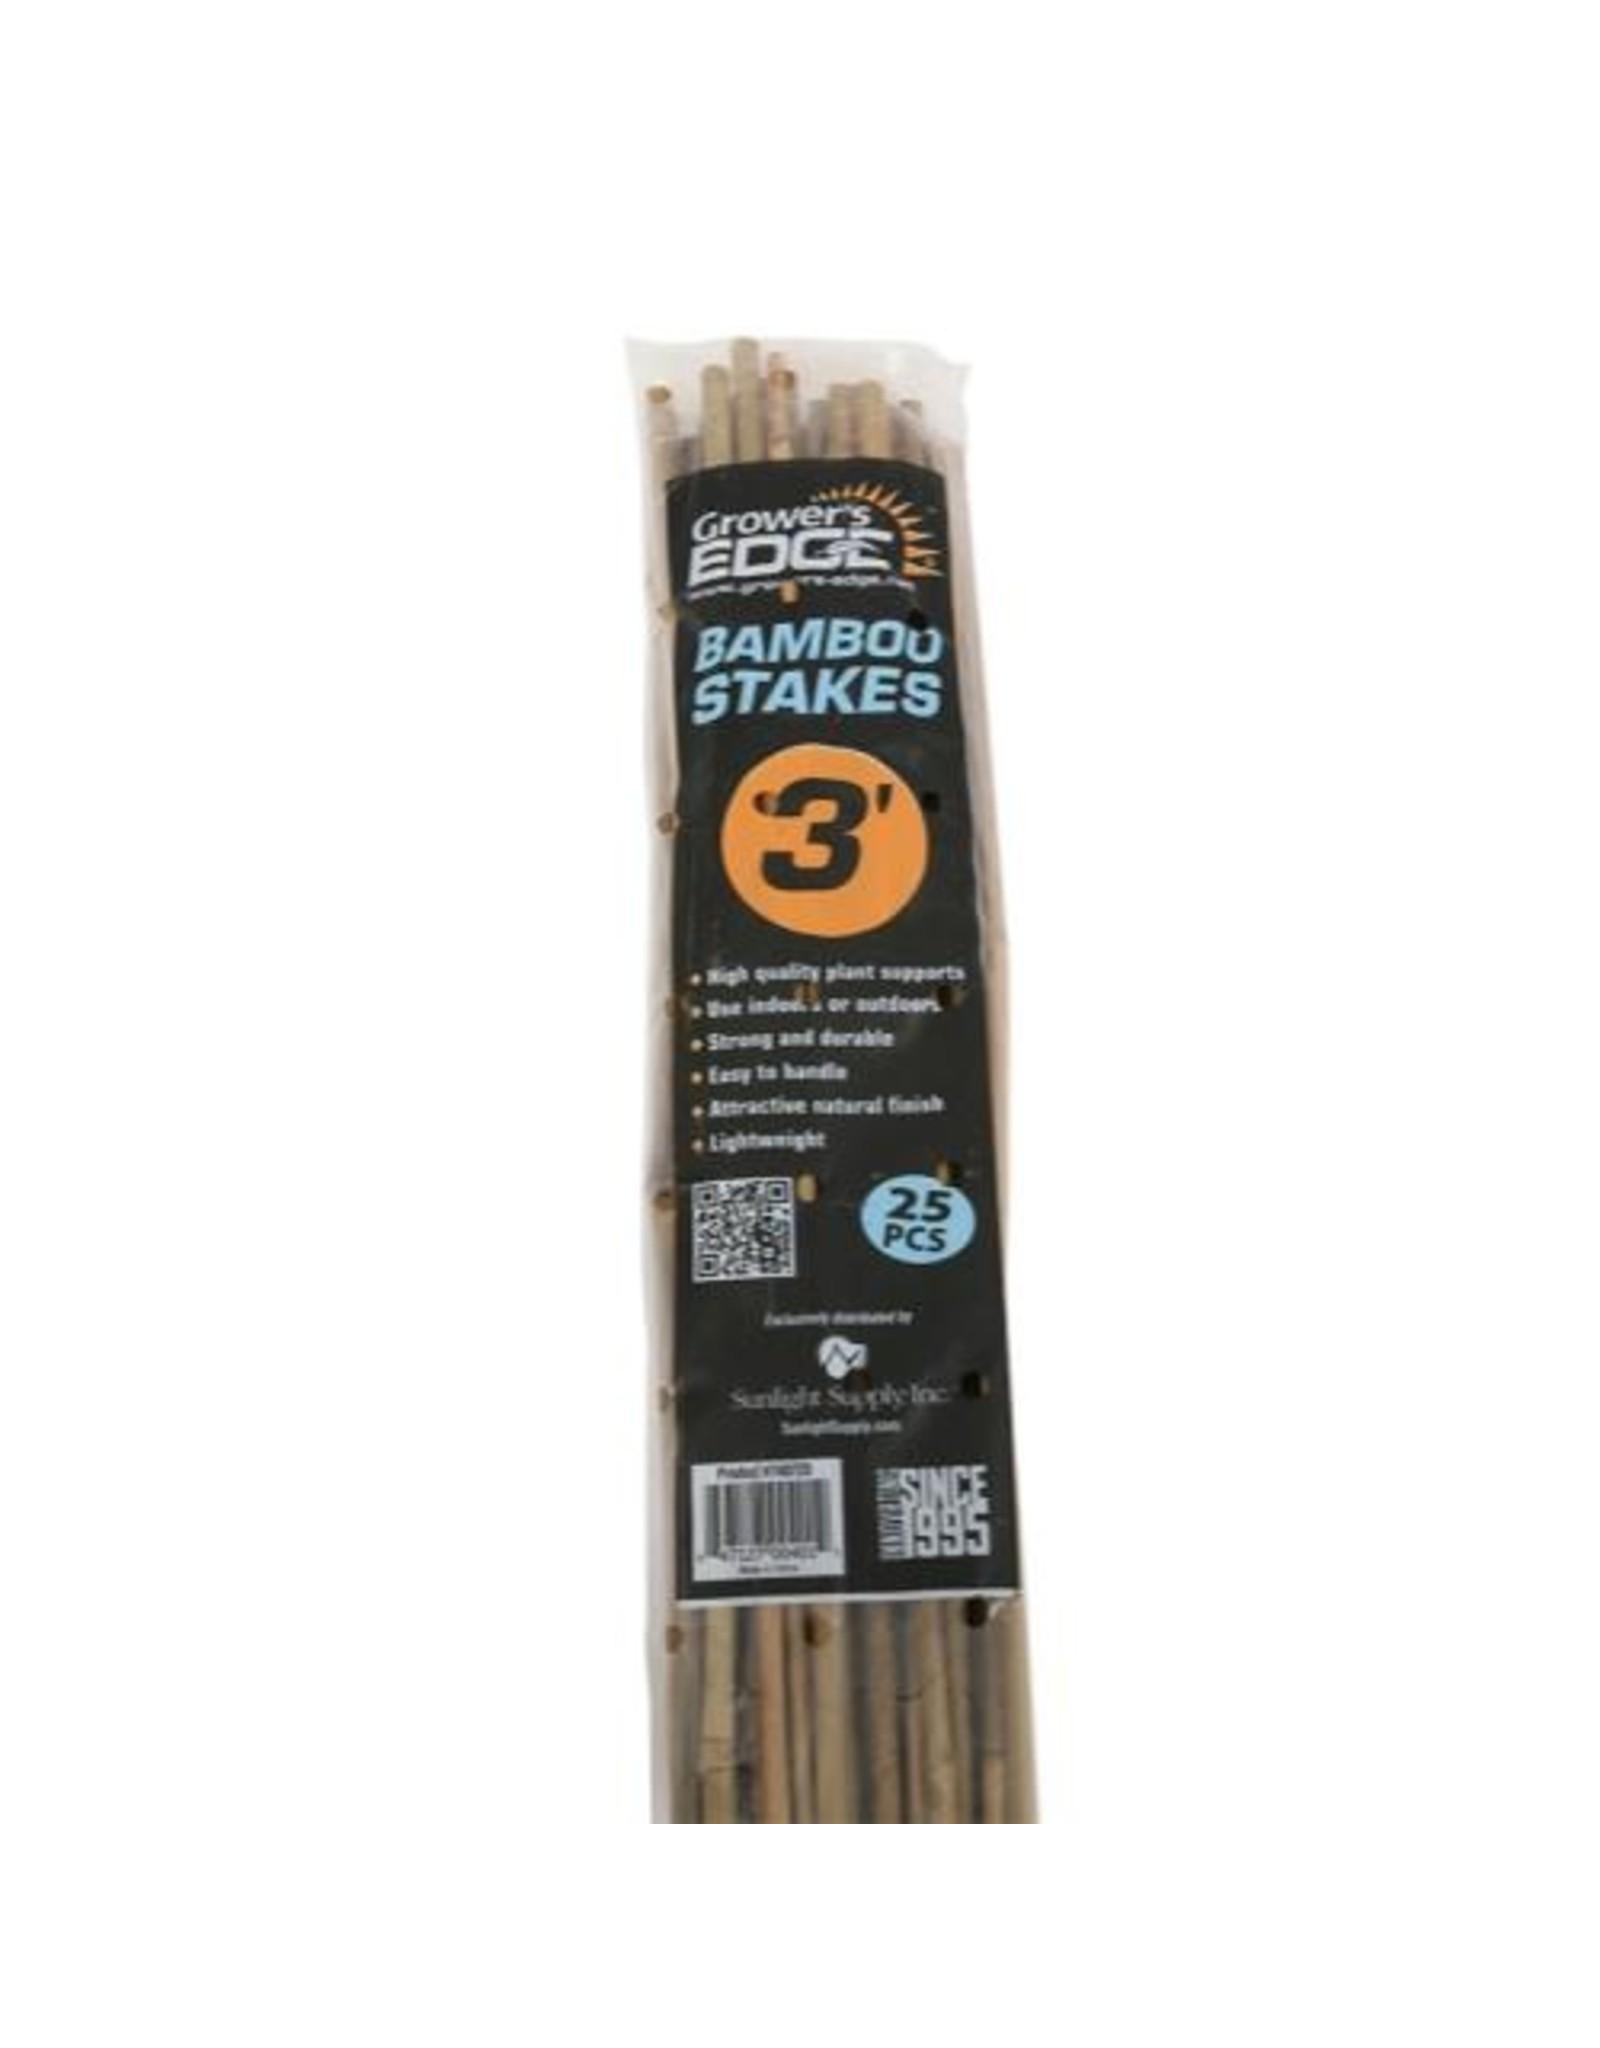 Bamboo Stake 3' Pack/25